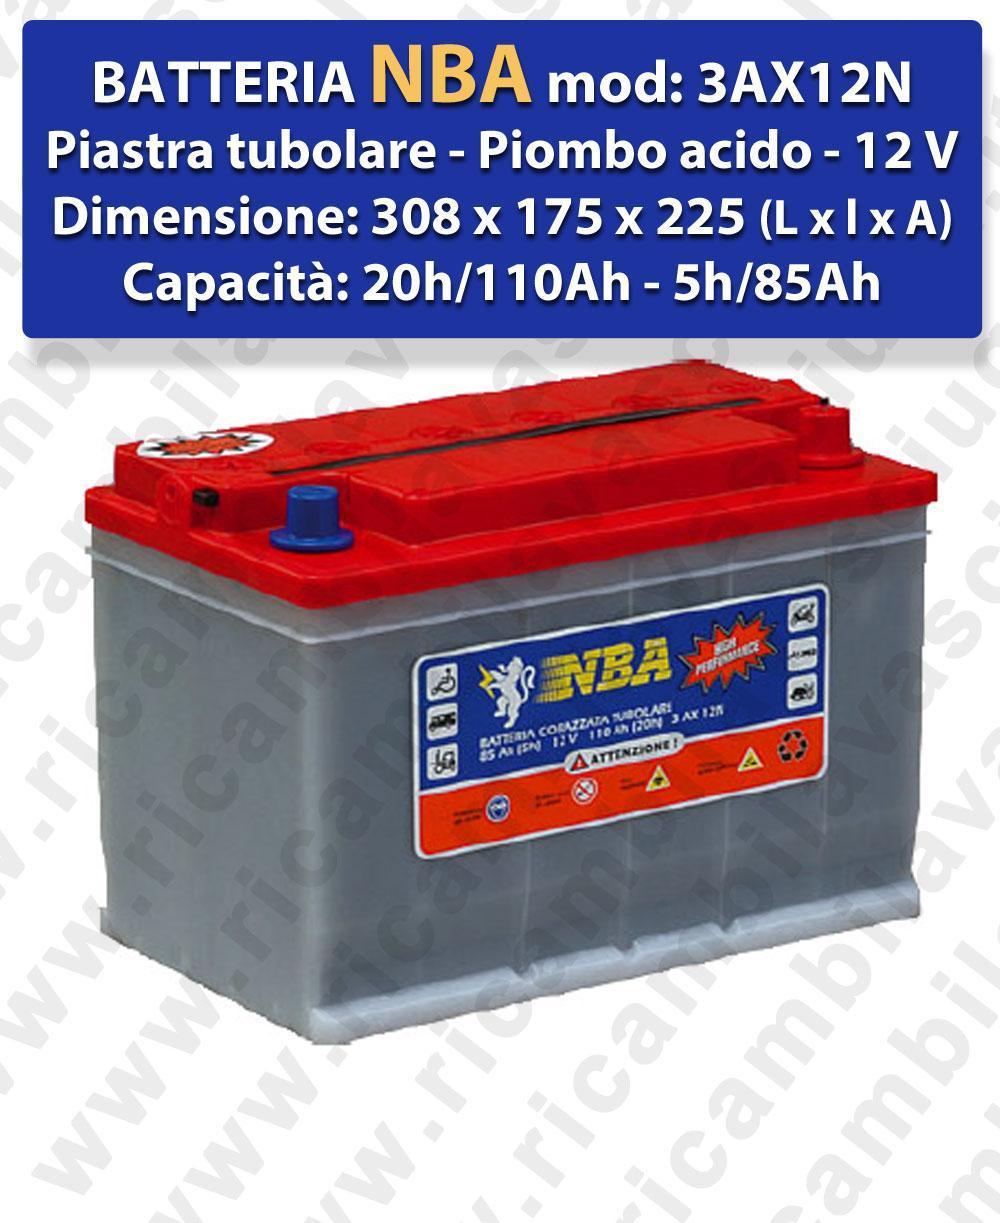 3AX12N Battery piombo - NBA 12V 110Ah 20/h